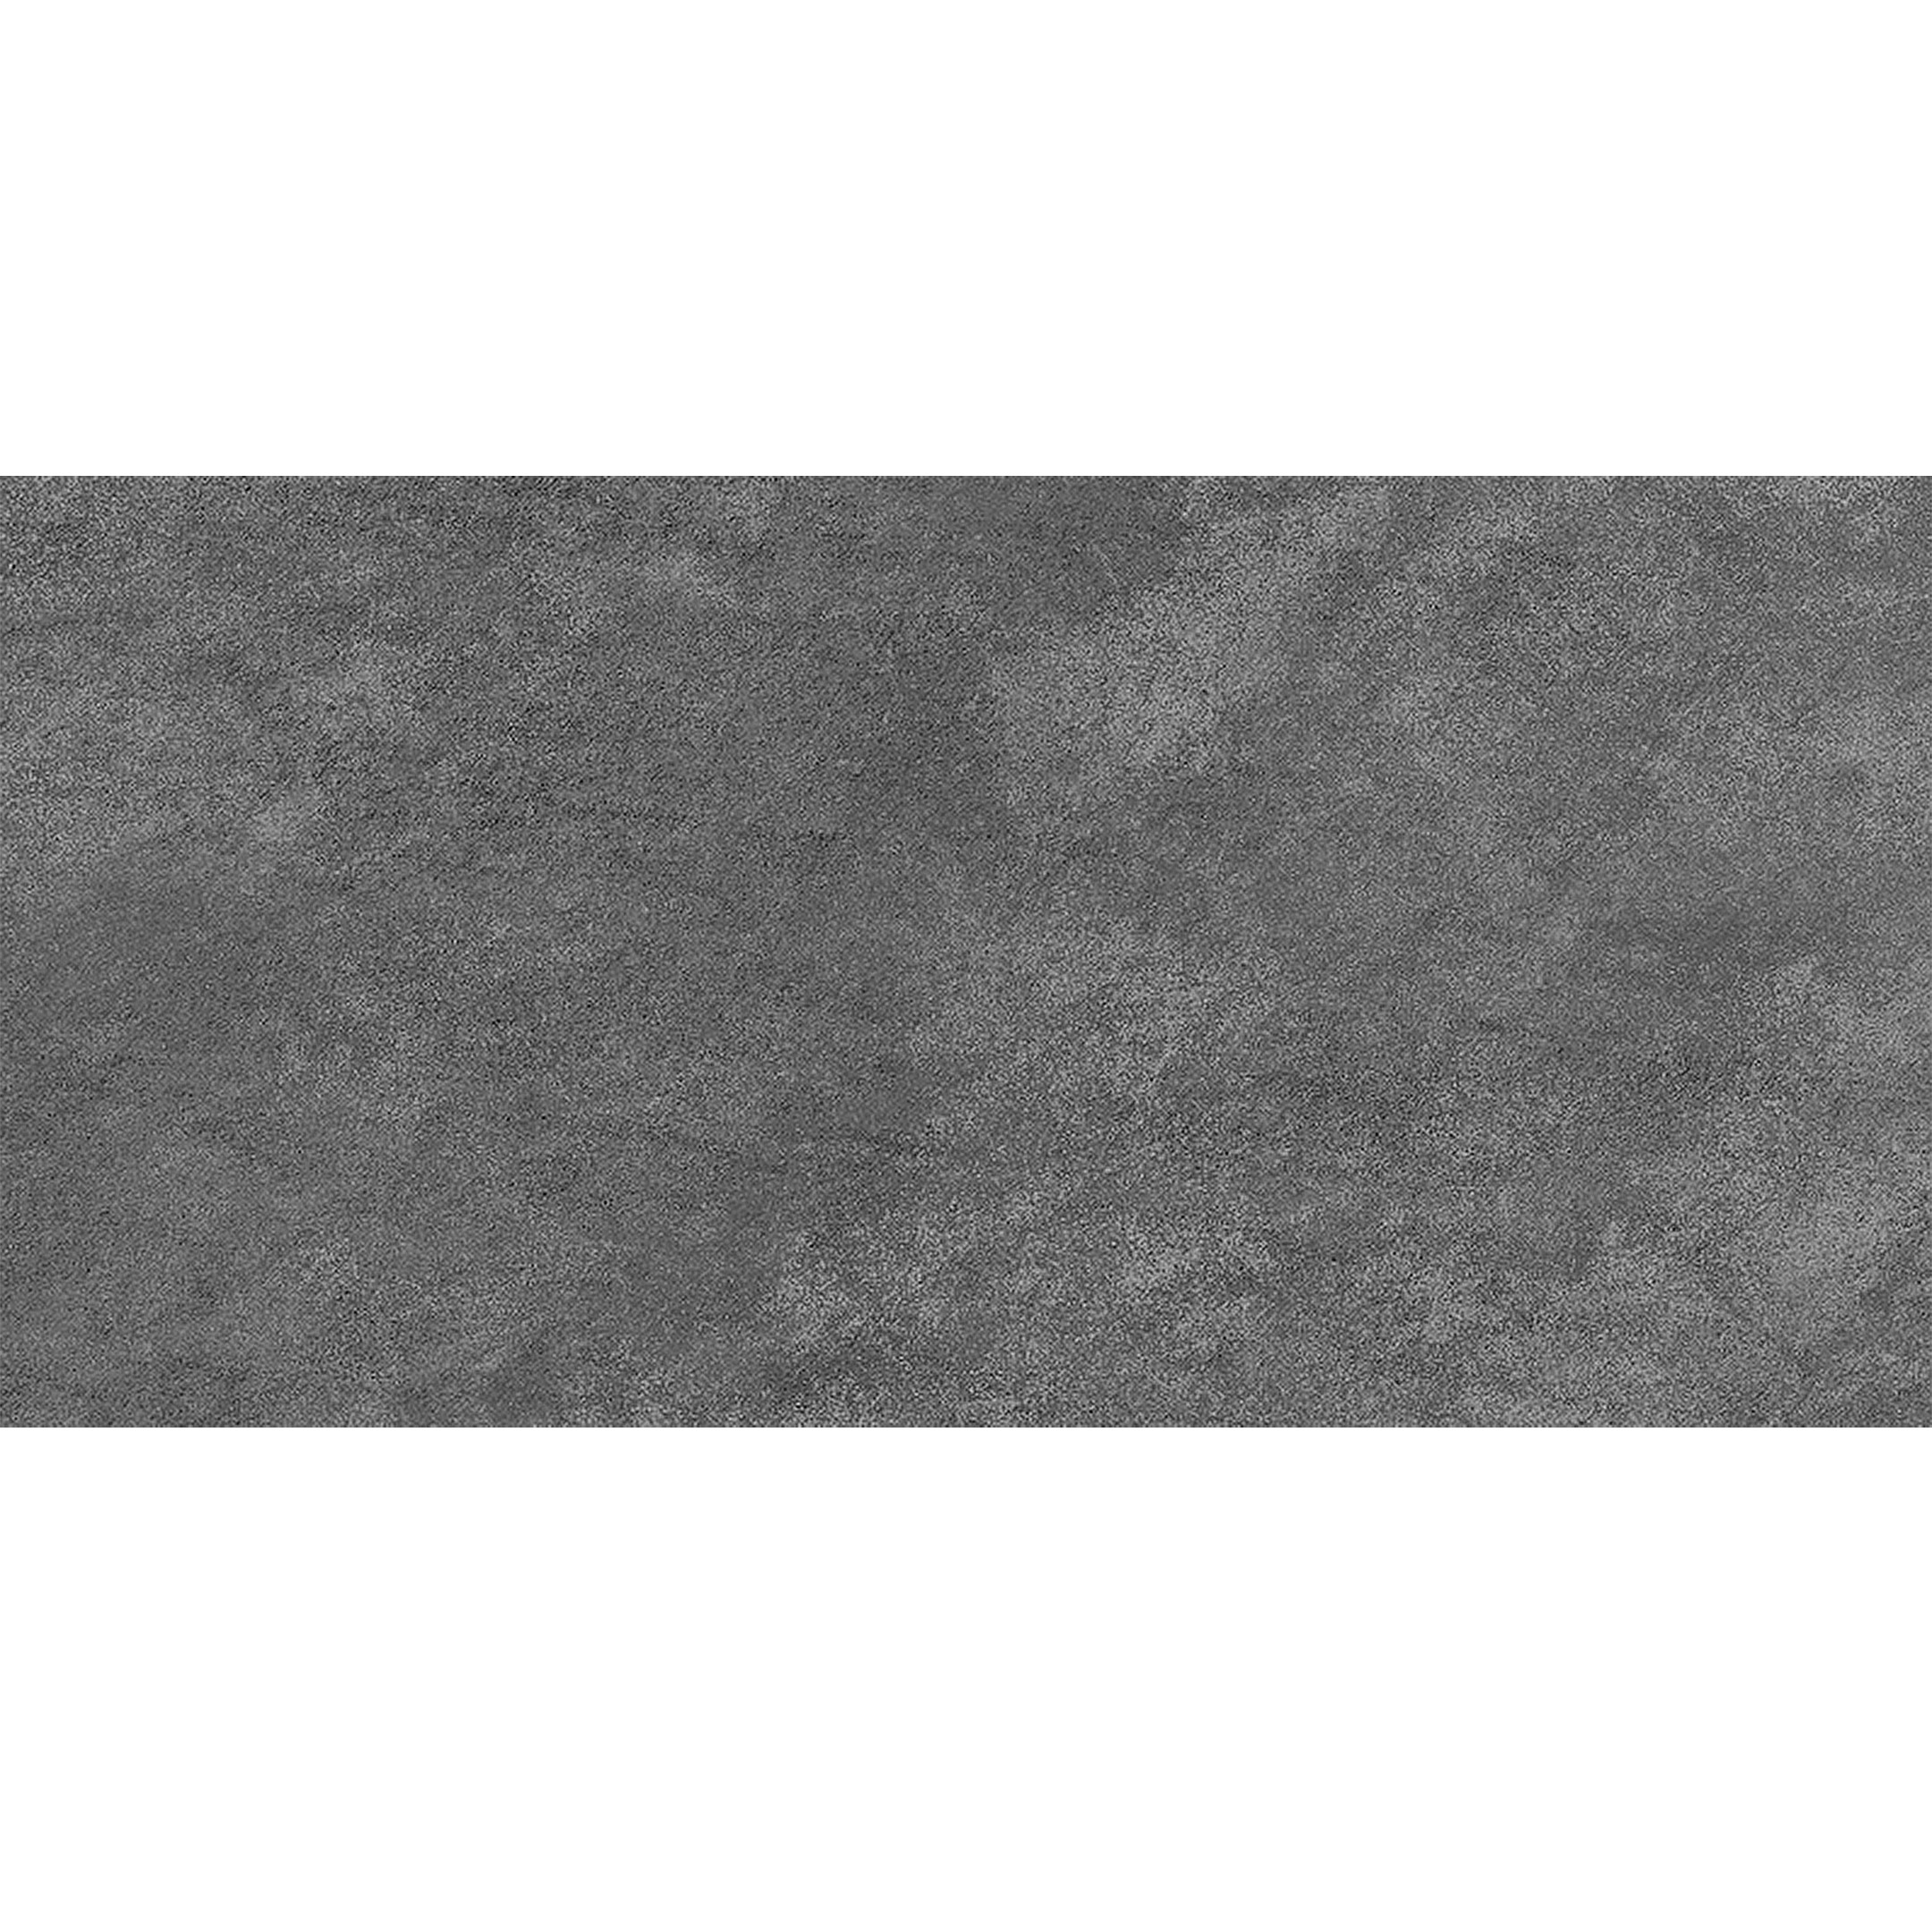 Керамогранит CERSANIT Orion 297х598х8,5мм темно-серый (9 шт=1,6 кв.м)